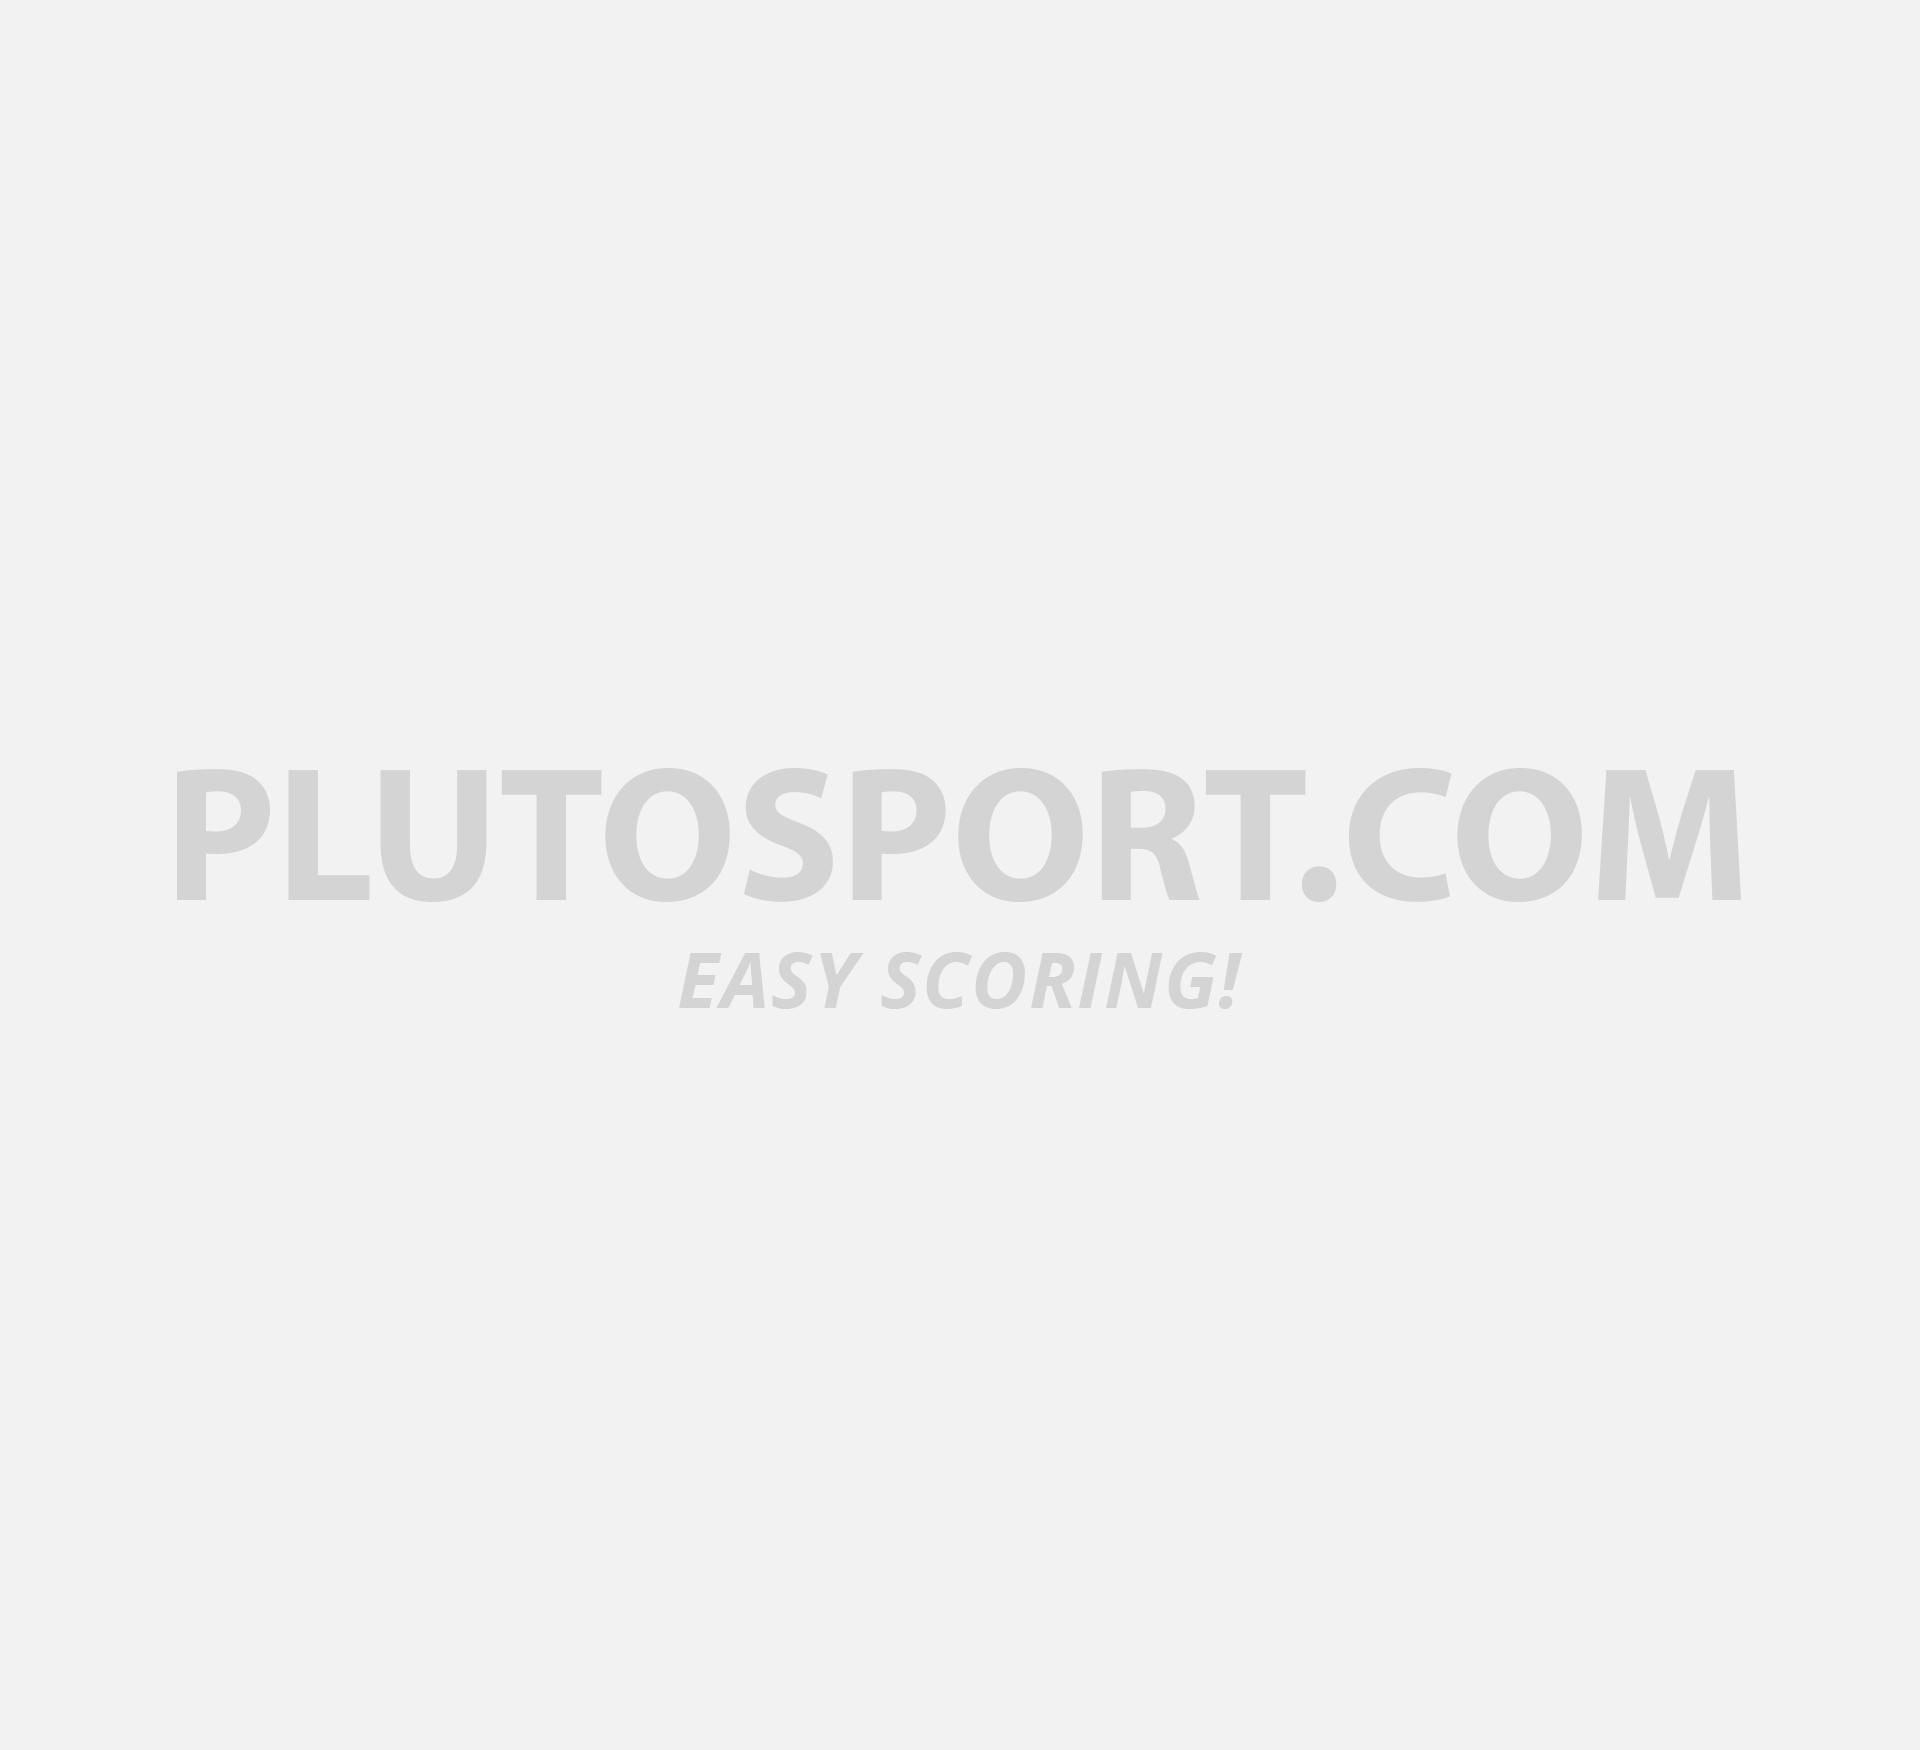 Classic Winterized Winterized Puma Classic Puma Suede Suede f6g7yb